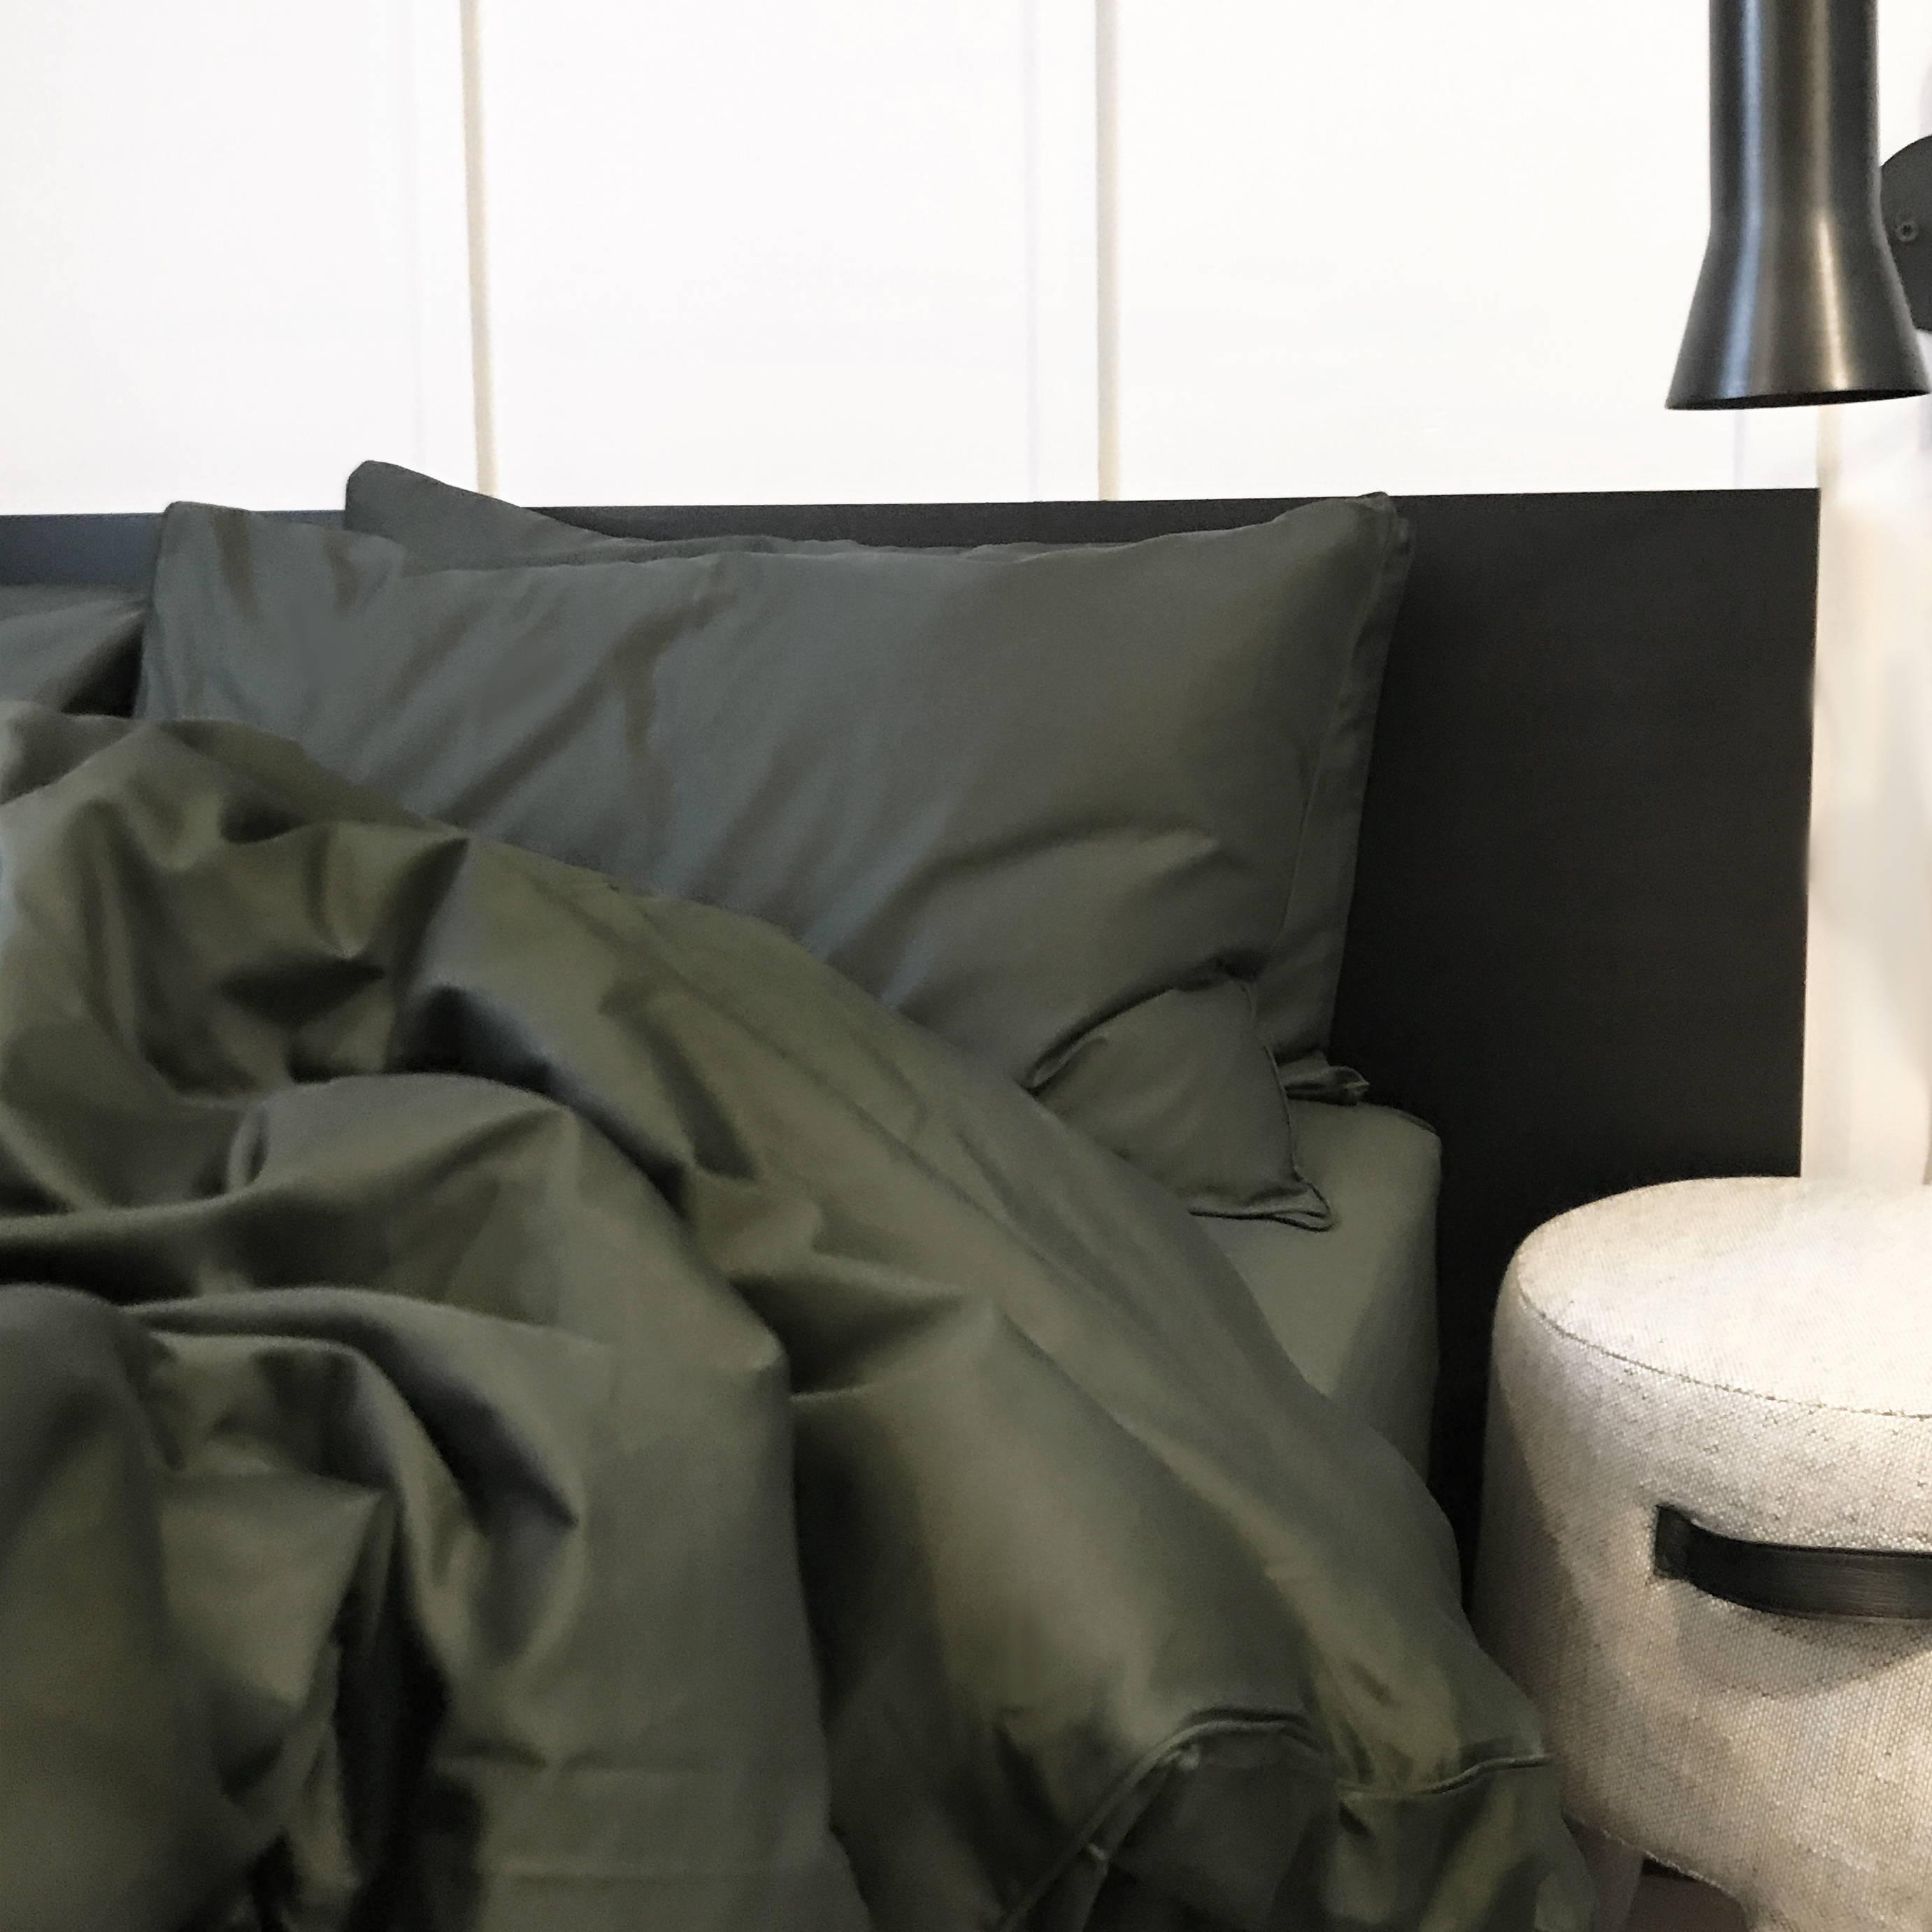 Hunter Dark Olive Khaki Green Long-Staple 100% Cotton Sheets | The Sheet Society